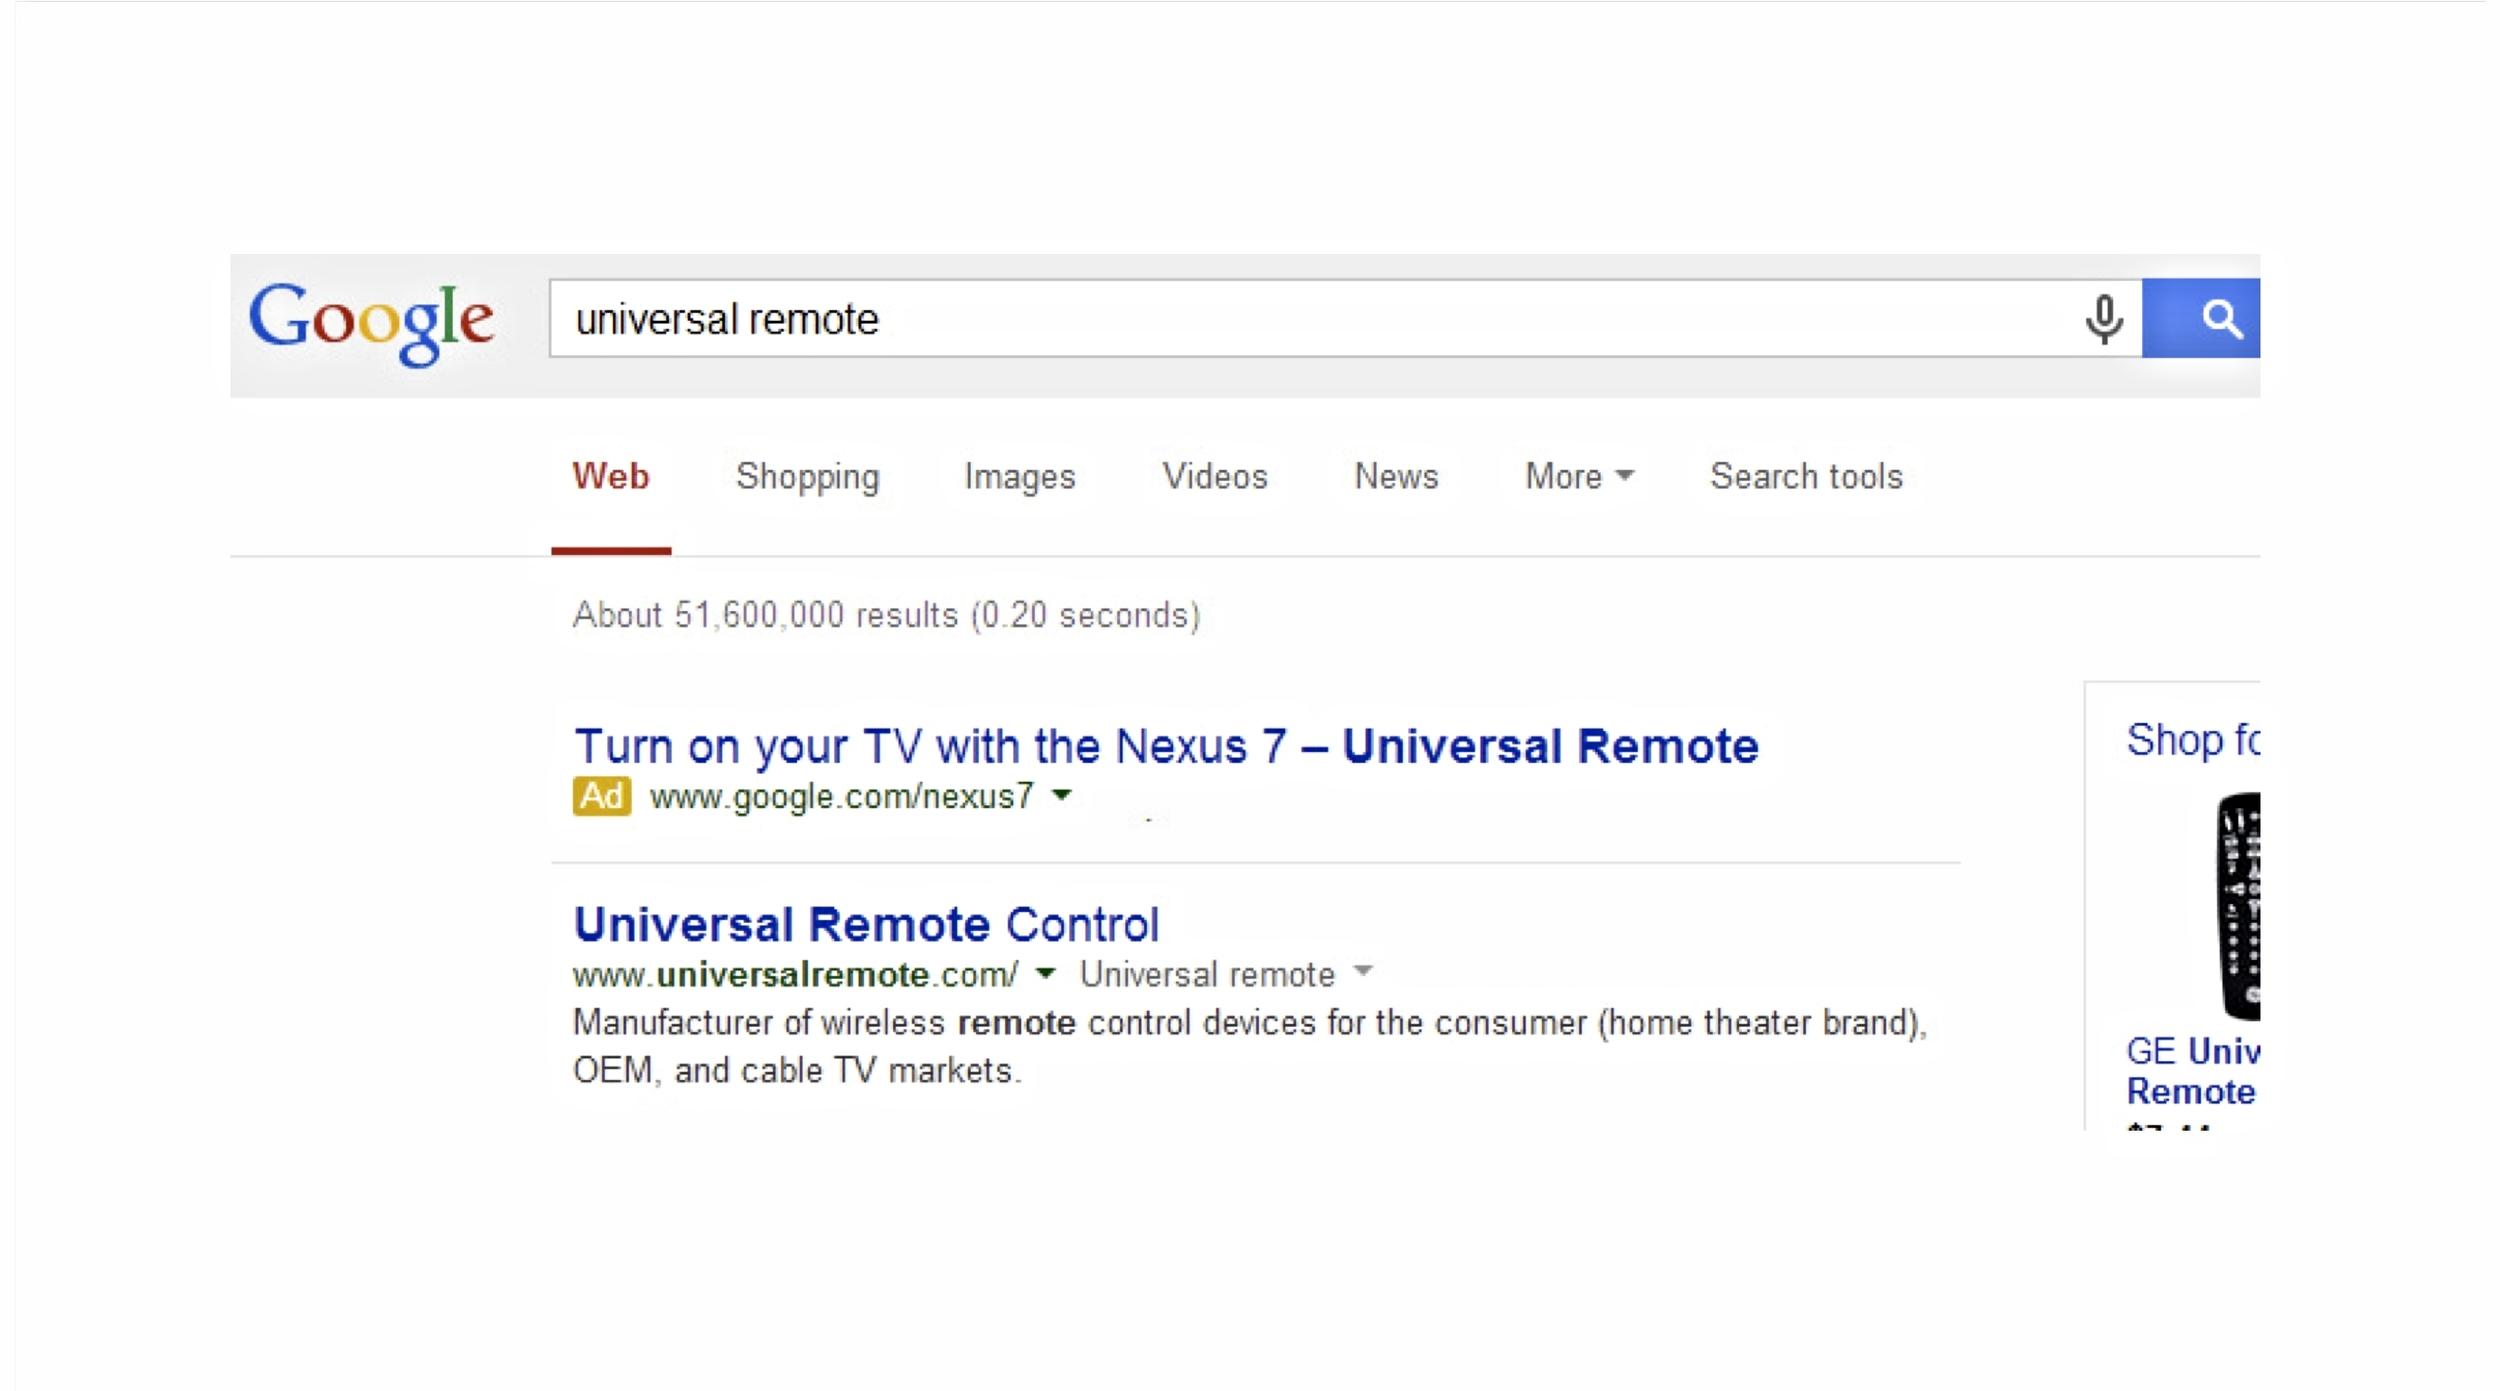 google ad 3.jpg